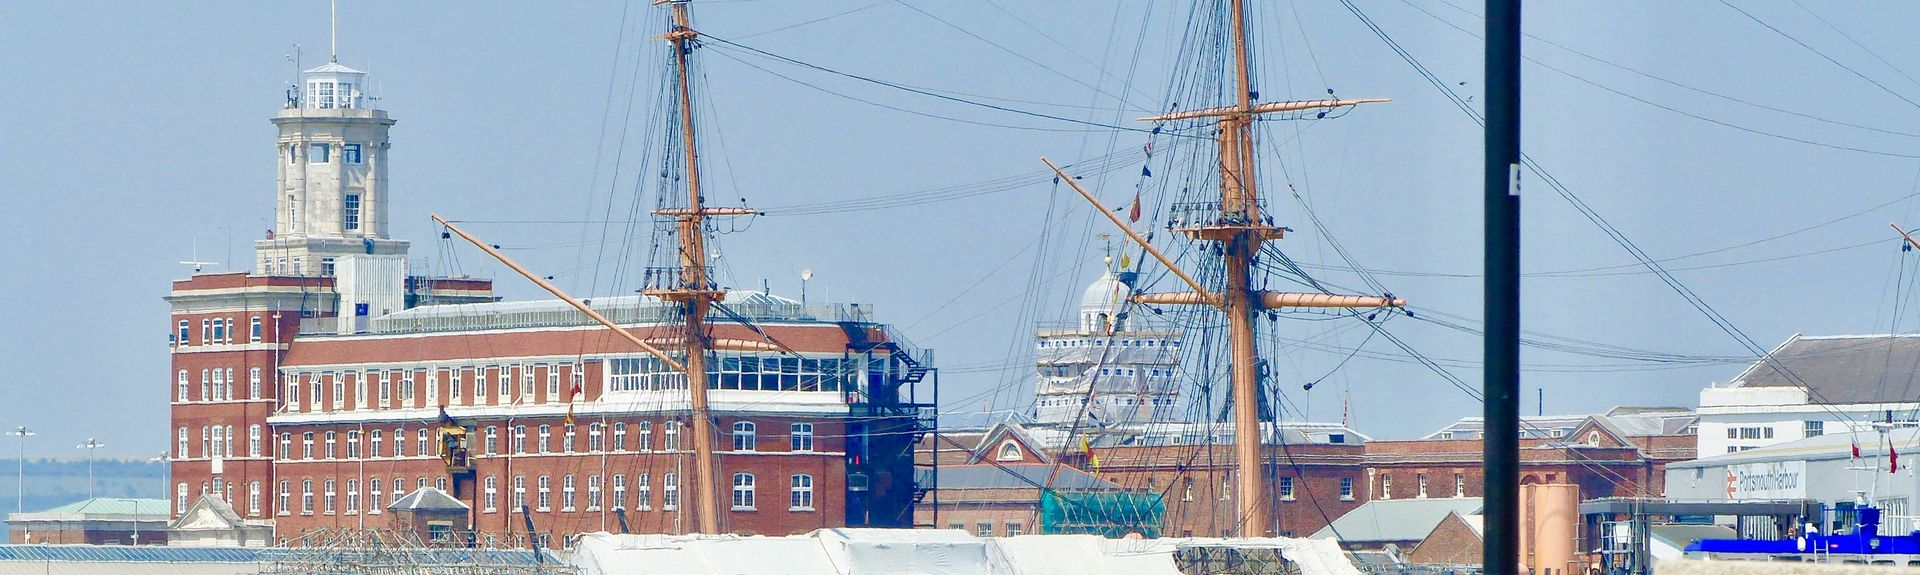 Old Portsmouth, Portsmouth, Portsmouth, UK